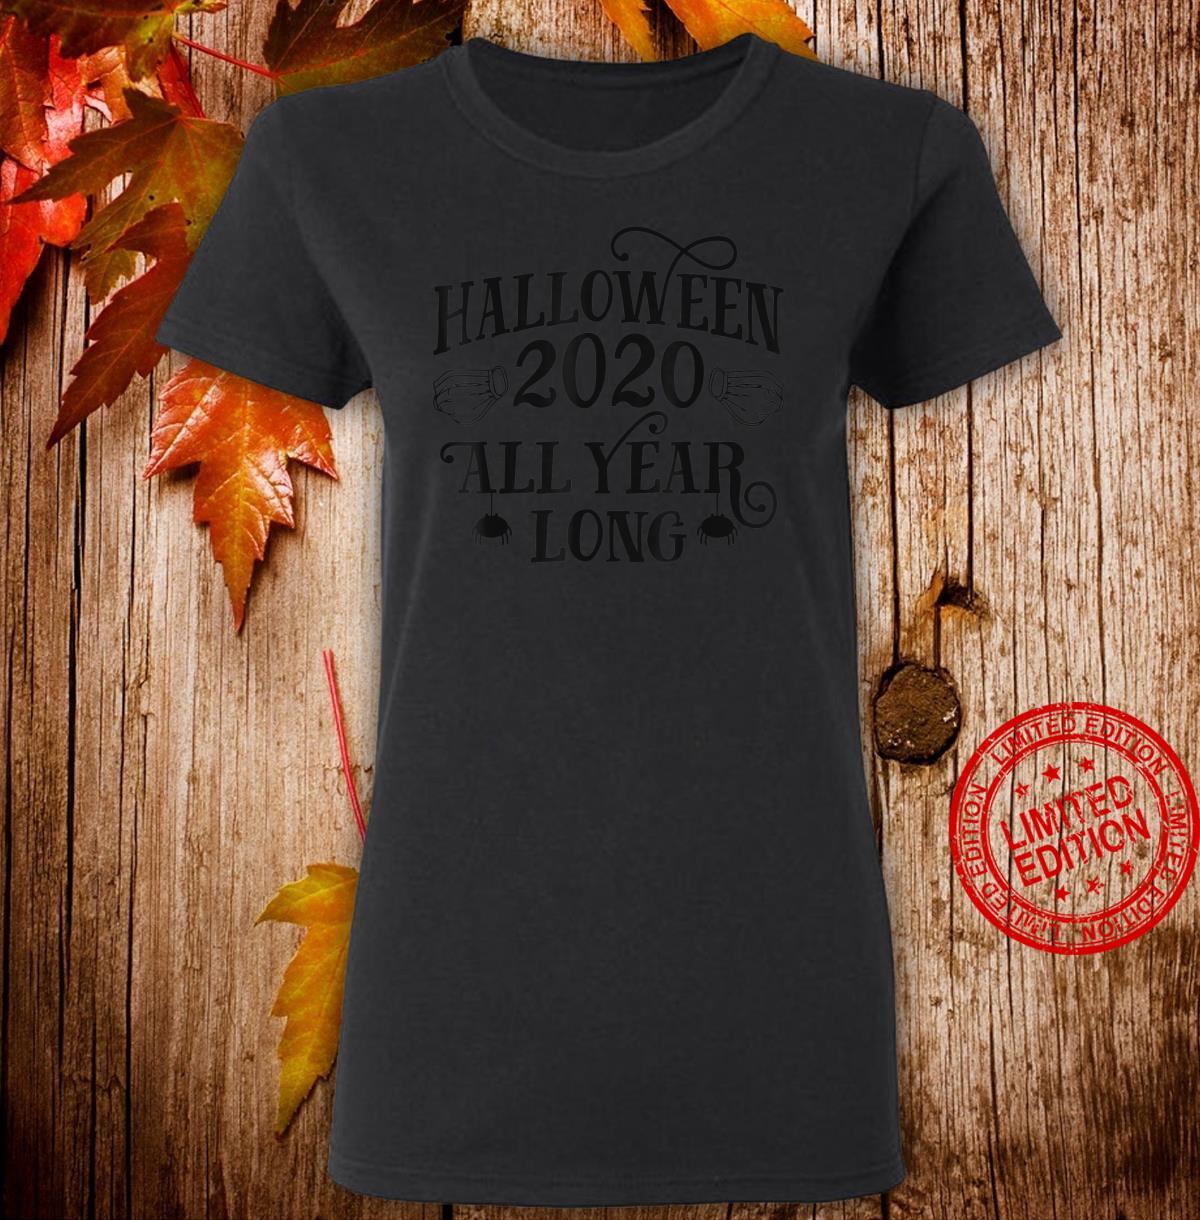 Halloween 2020 All Year Long Halloween Face Mask Shirt ladies tee